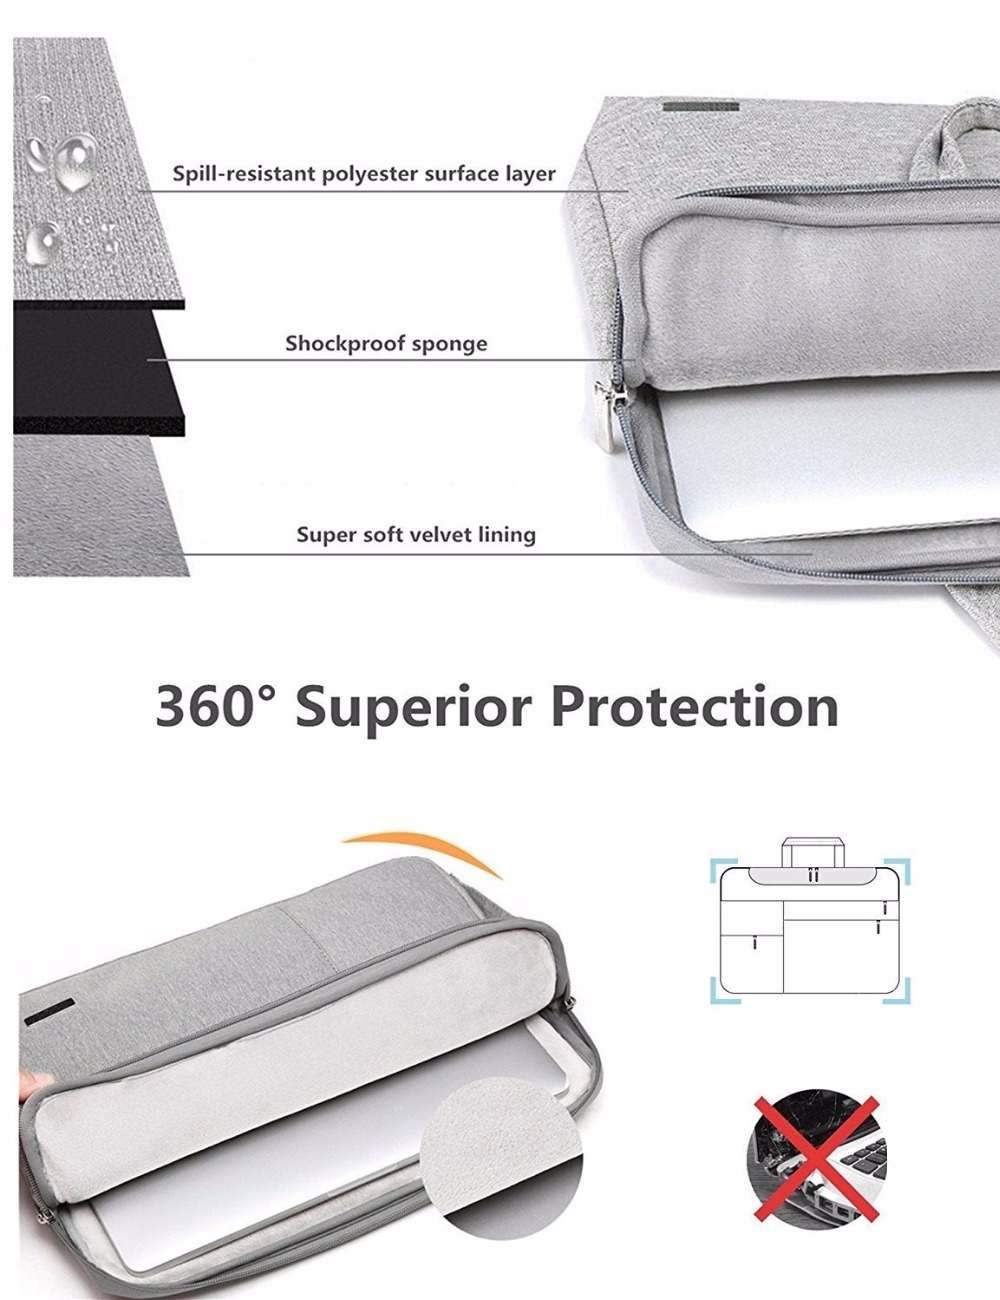 Portable laptop bag 13.3 Handbag Air Pro 11 12 13 14 15.6 Laptop Bag Sleeve Case For Dell HP Macbook Xiaomi Surface pro 3 4